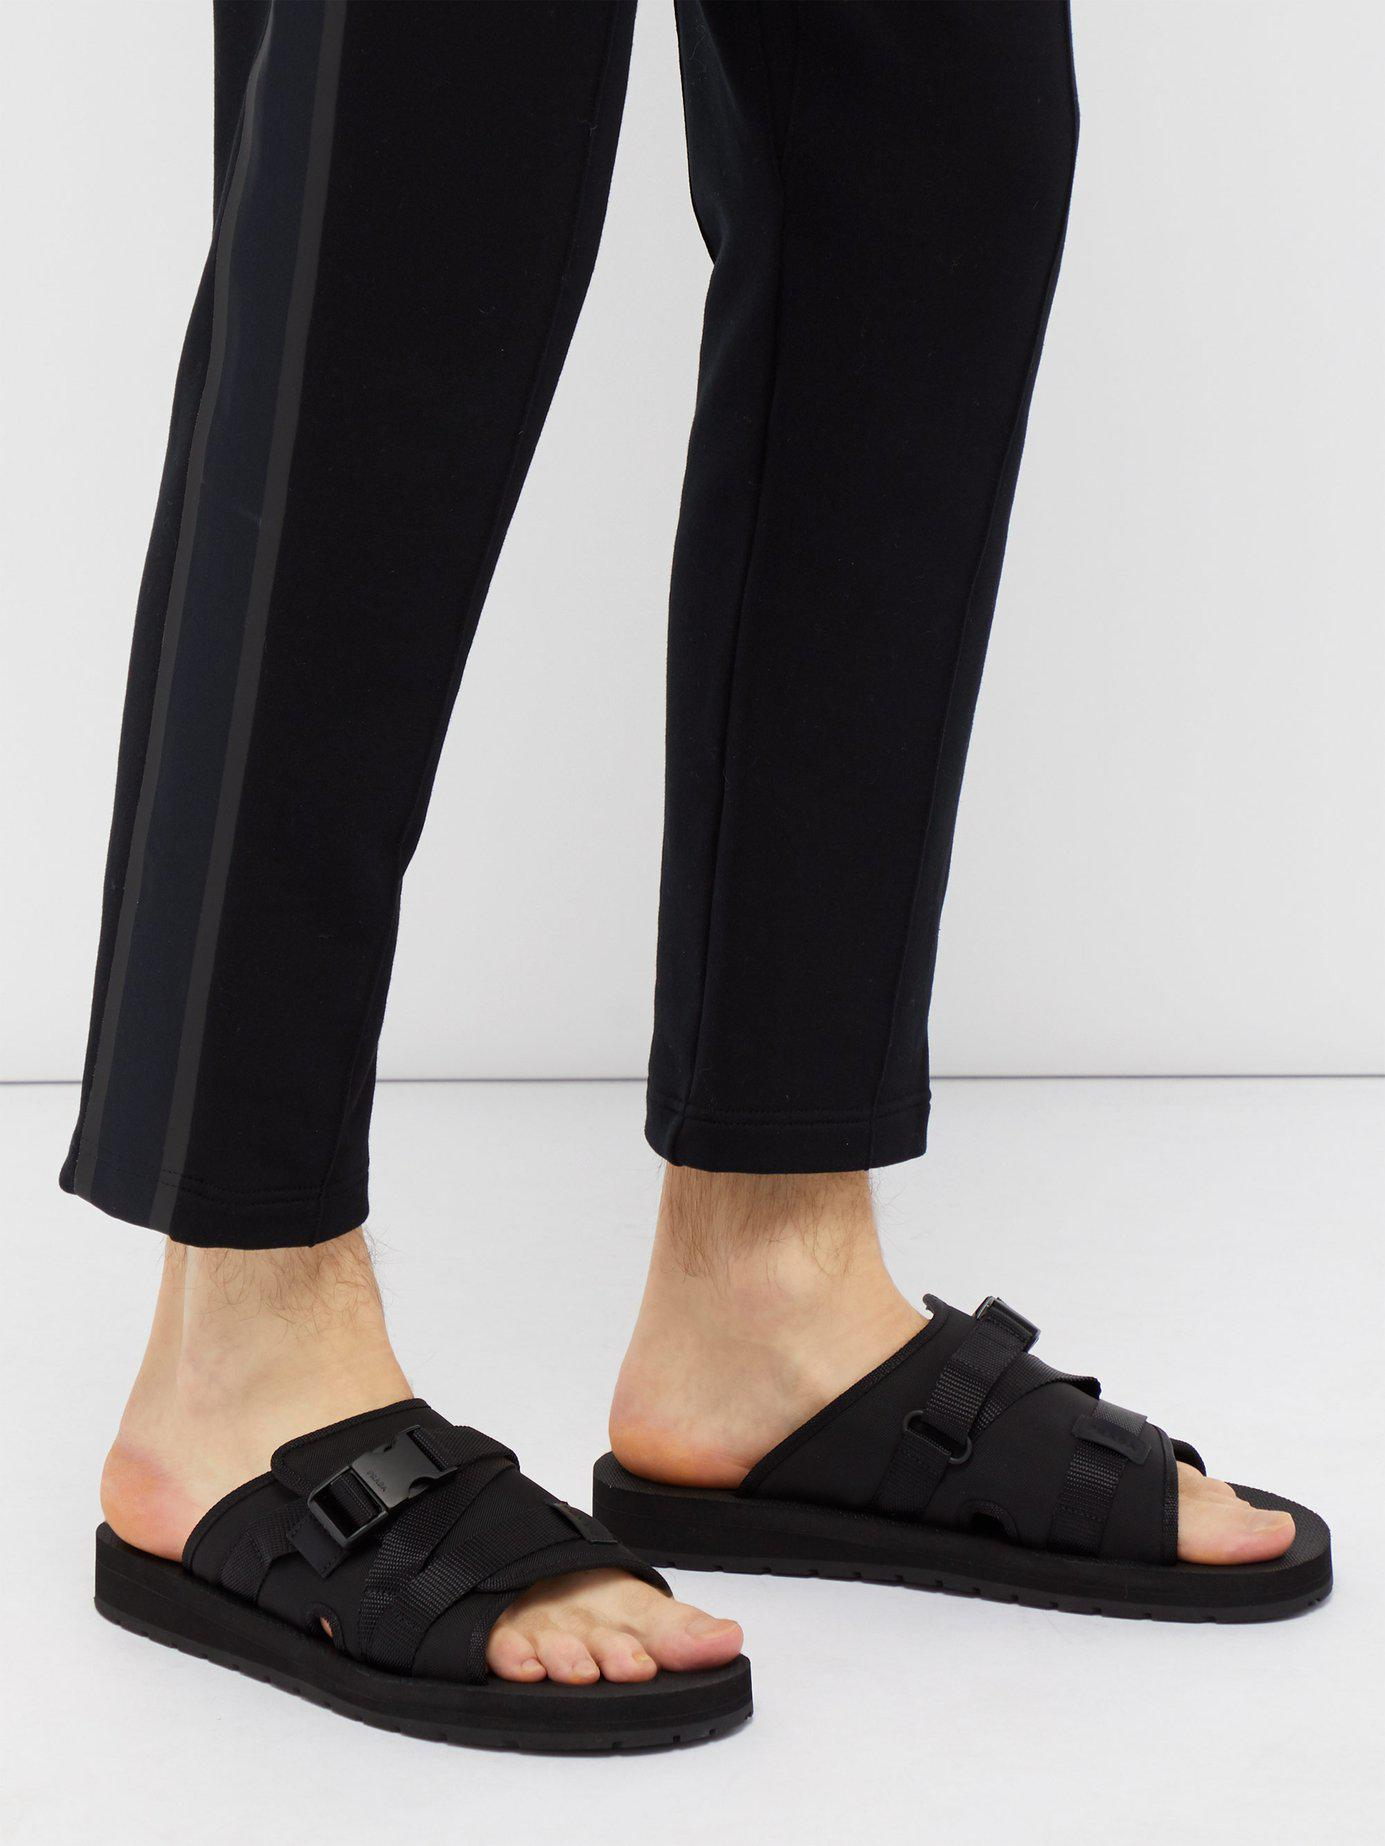 cb65962e0db4 Lyst - Prada Buckle Open-toe Sandals in Black for Men - Save 48%